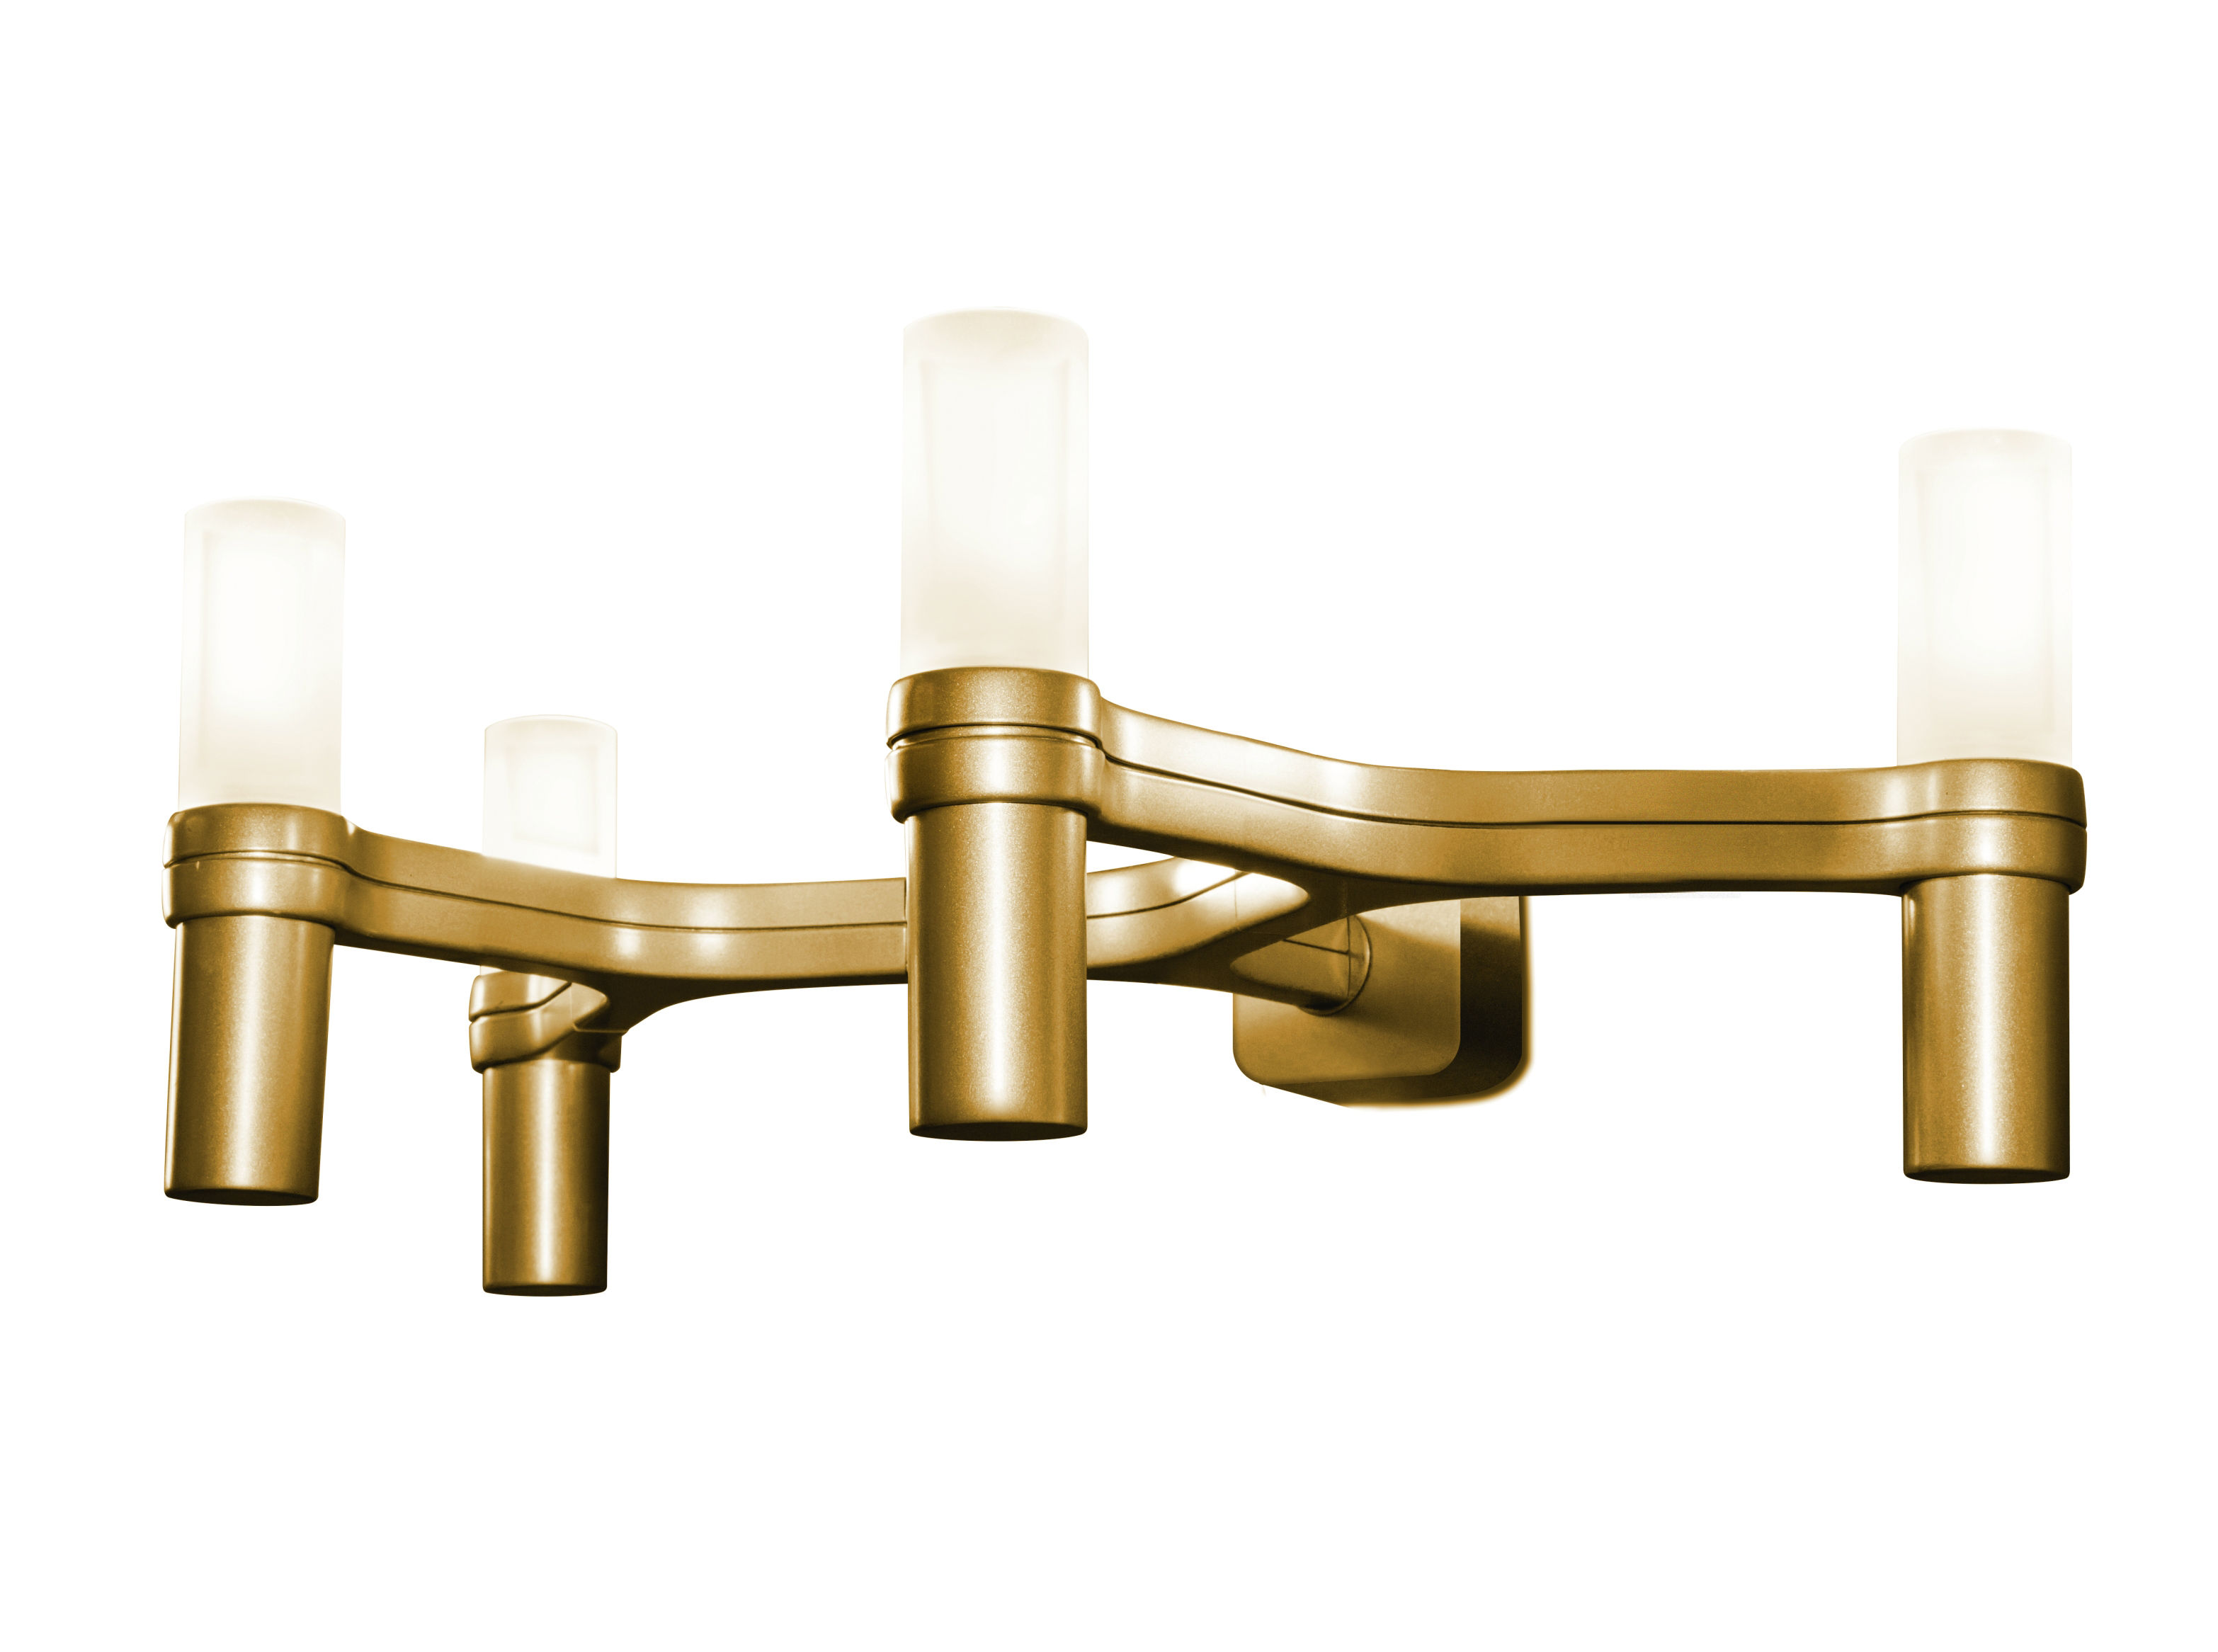 Lighting - Wall Lights - Crown Wall light - L 48 cm by Nemo - Gold - Opal Glass, Painted cast aluminium